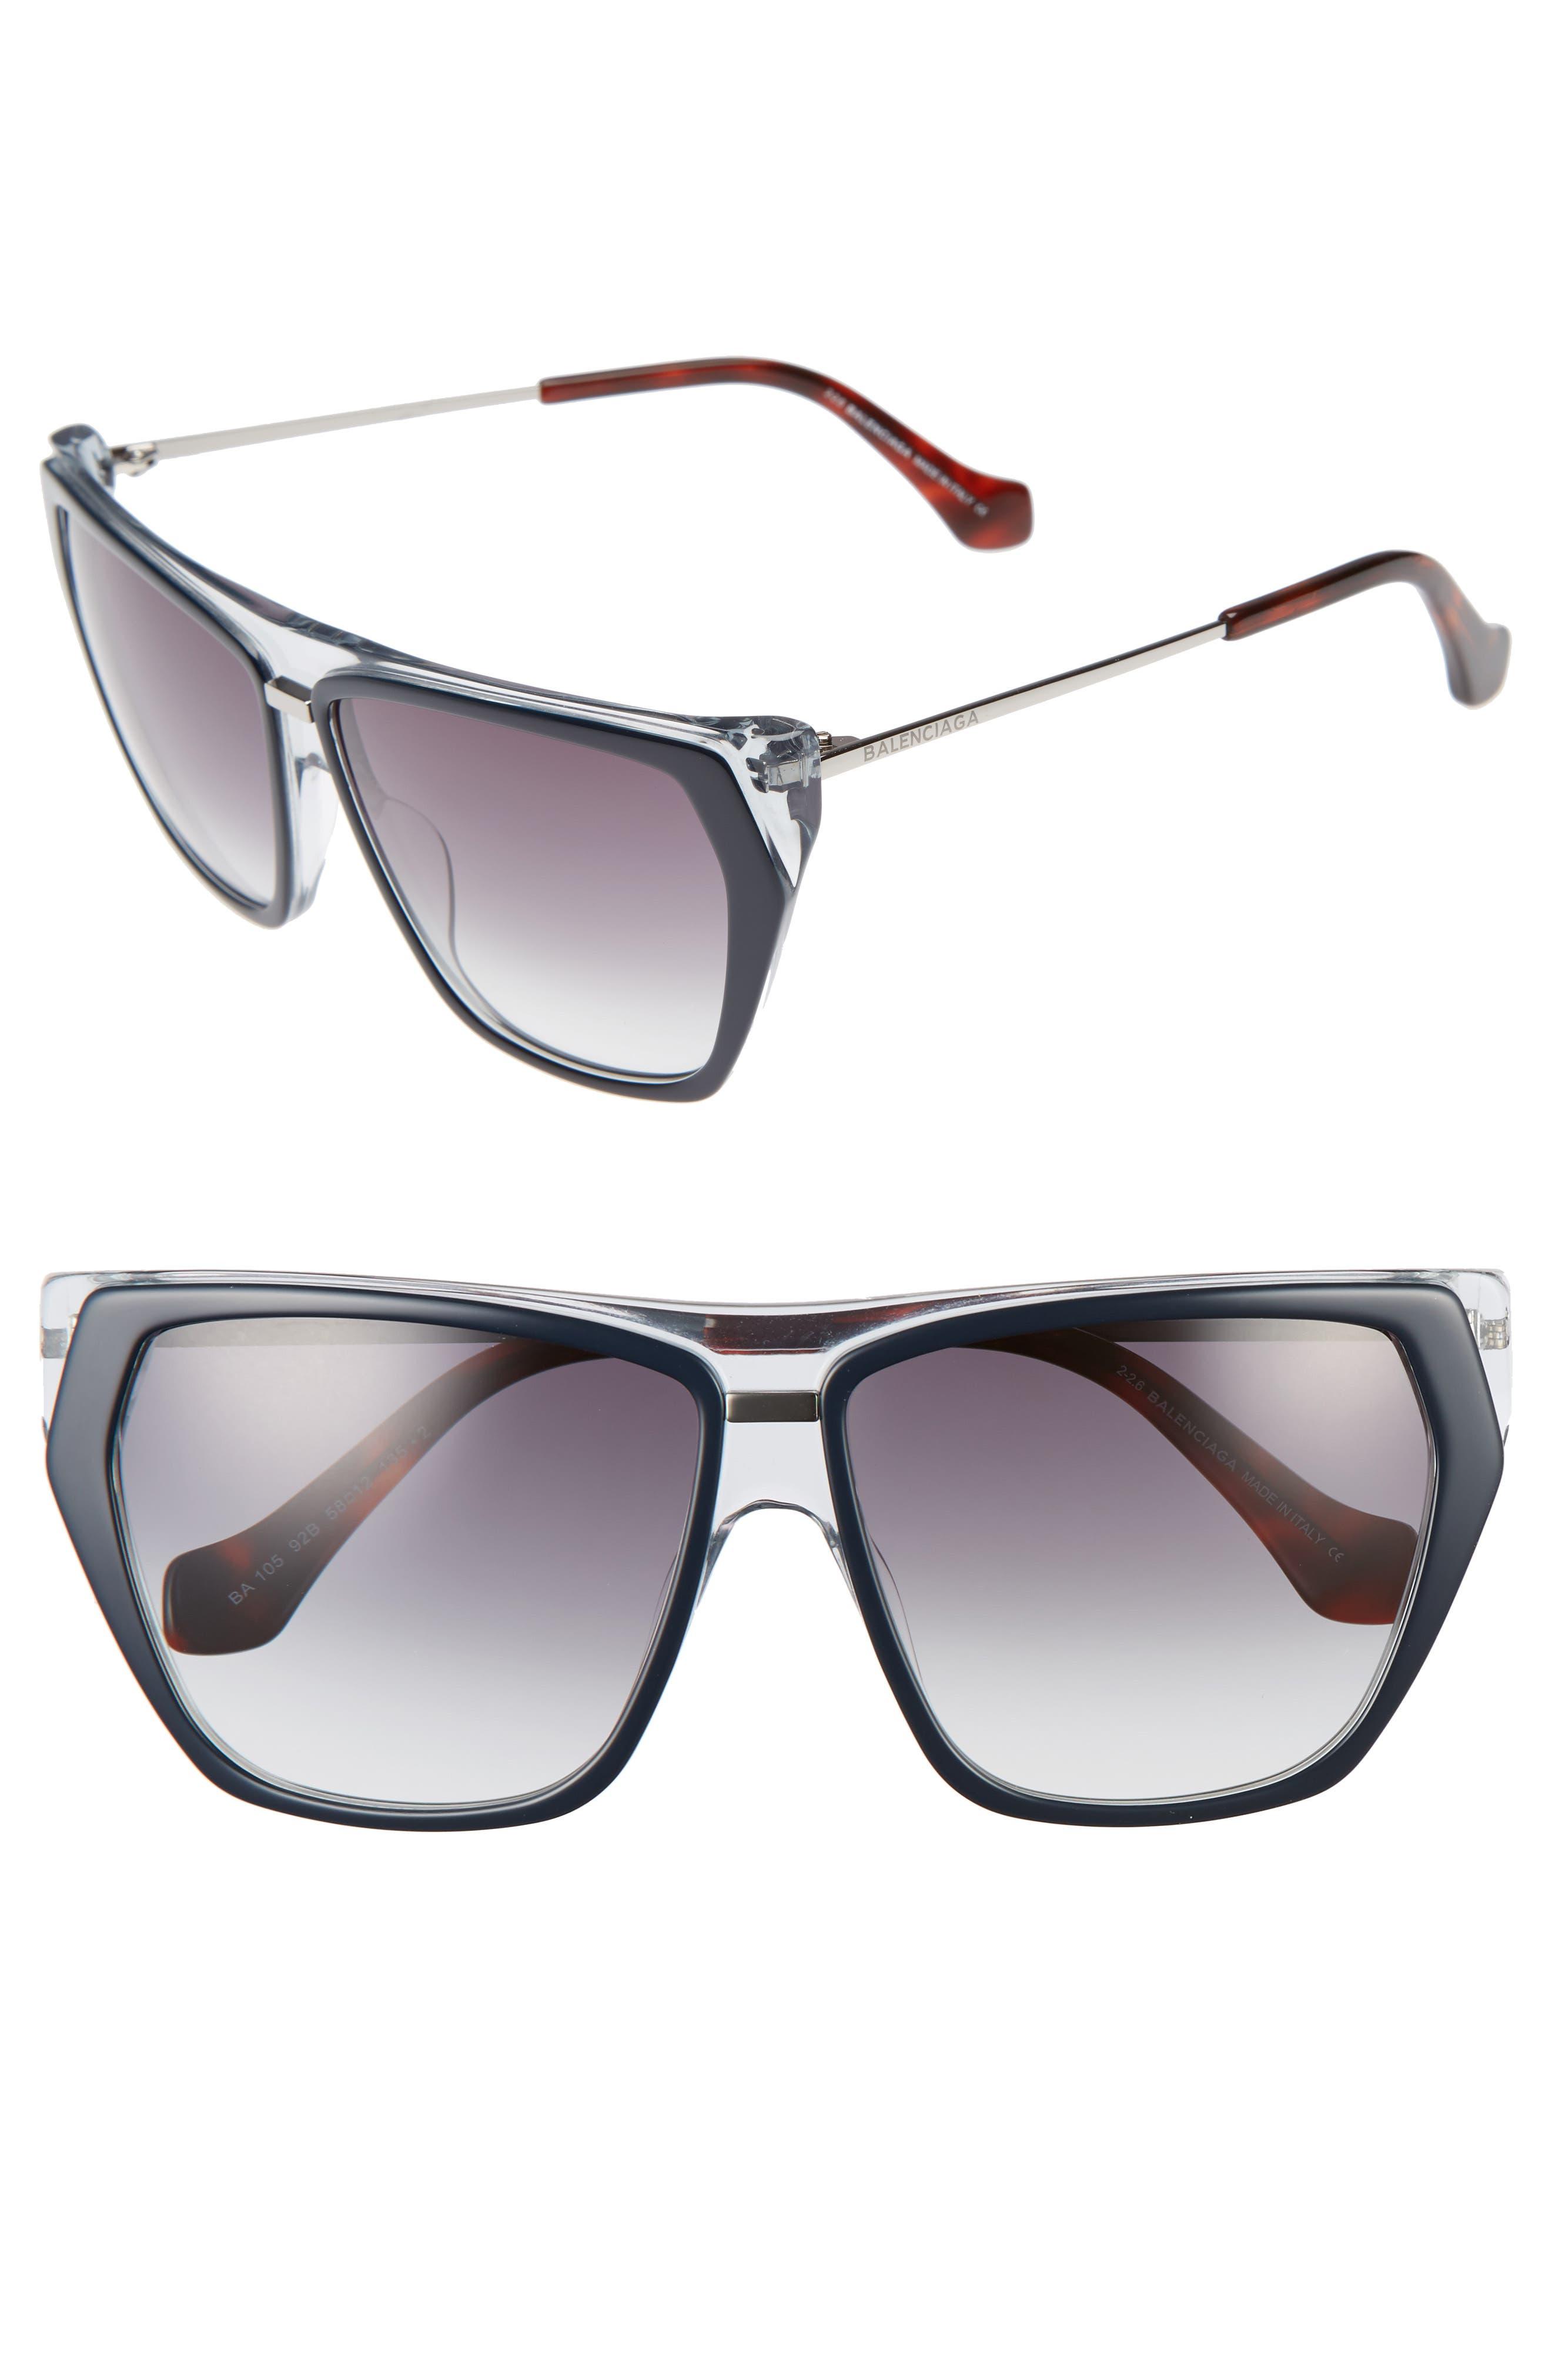 58mm Gradient Sunglasses,                         Main,                         color, Blu Crys/ Havana/ Grdient Smke